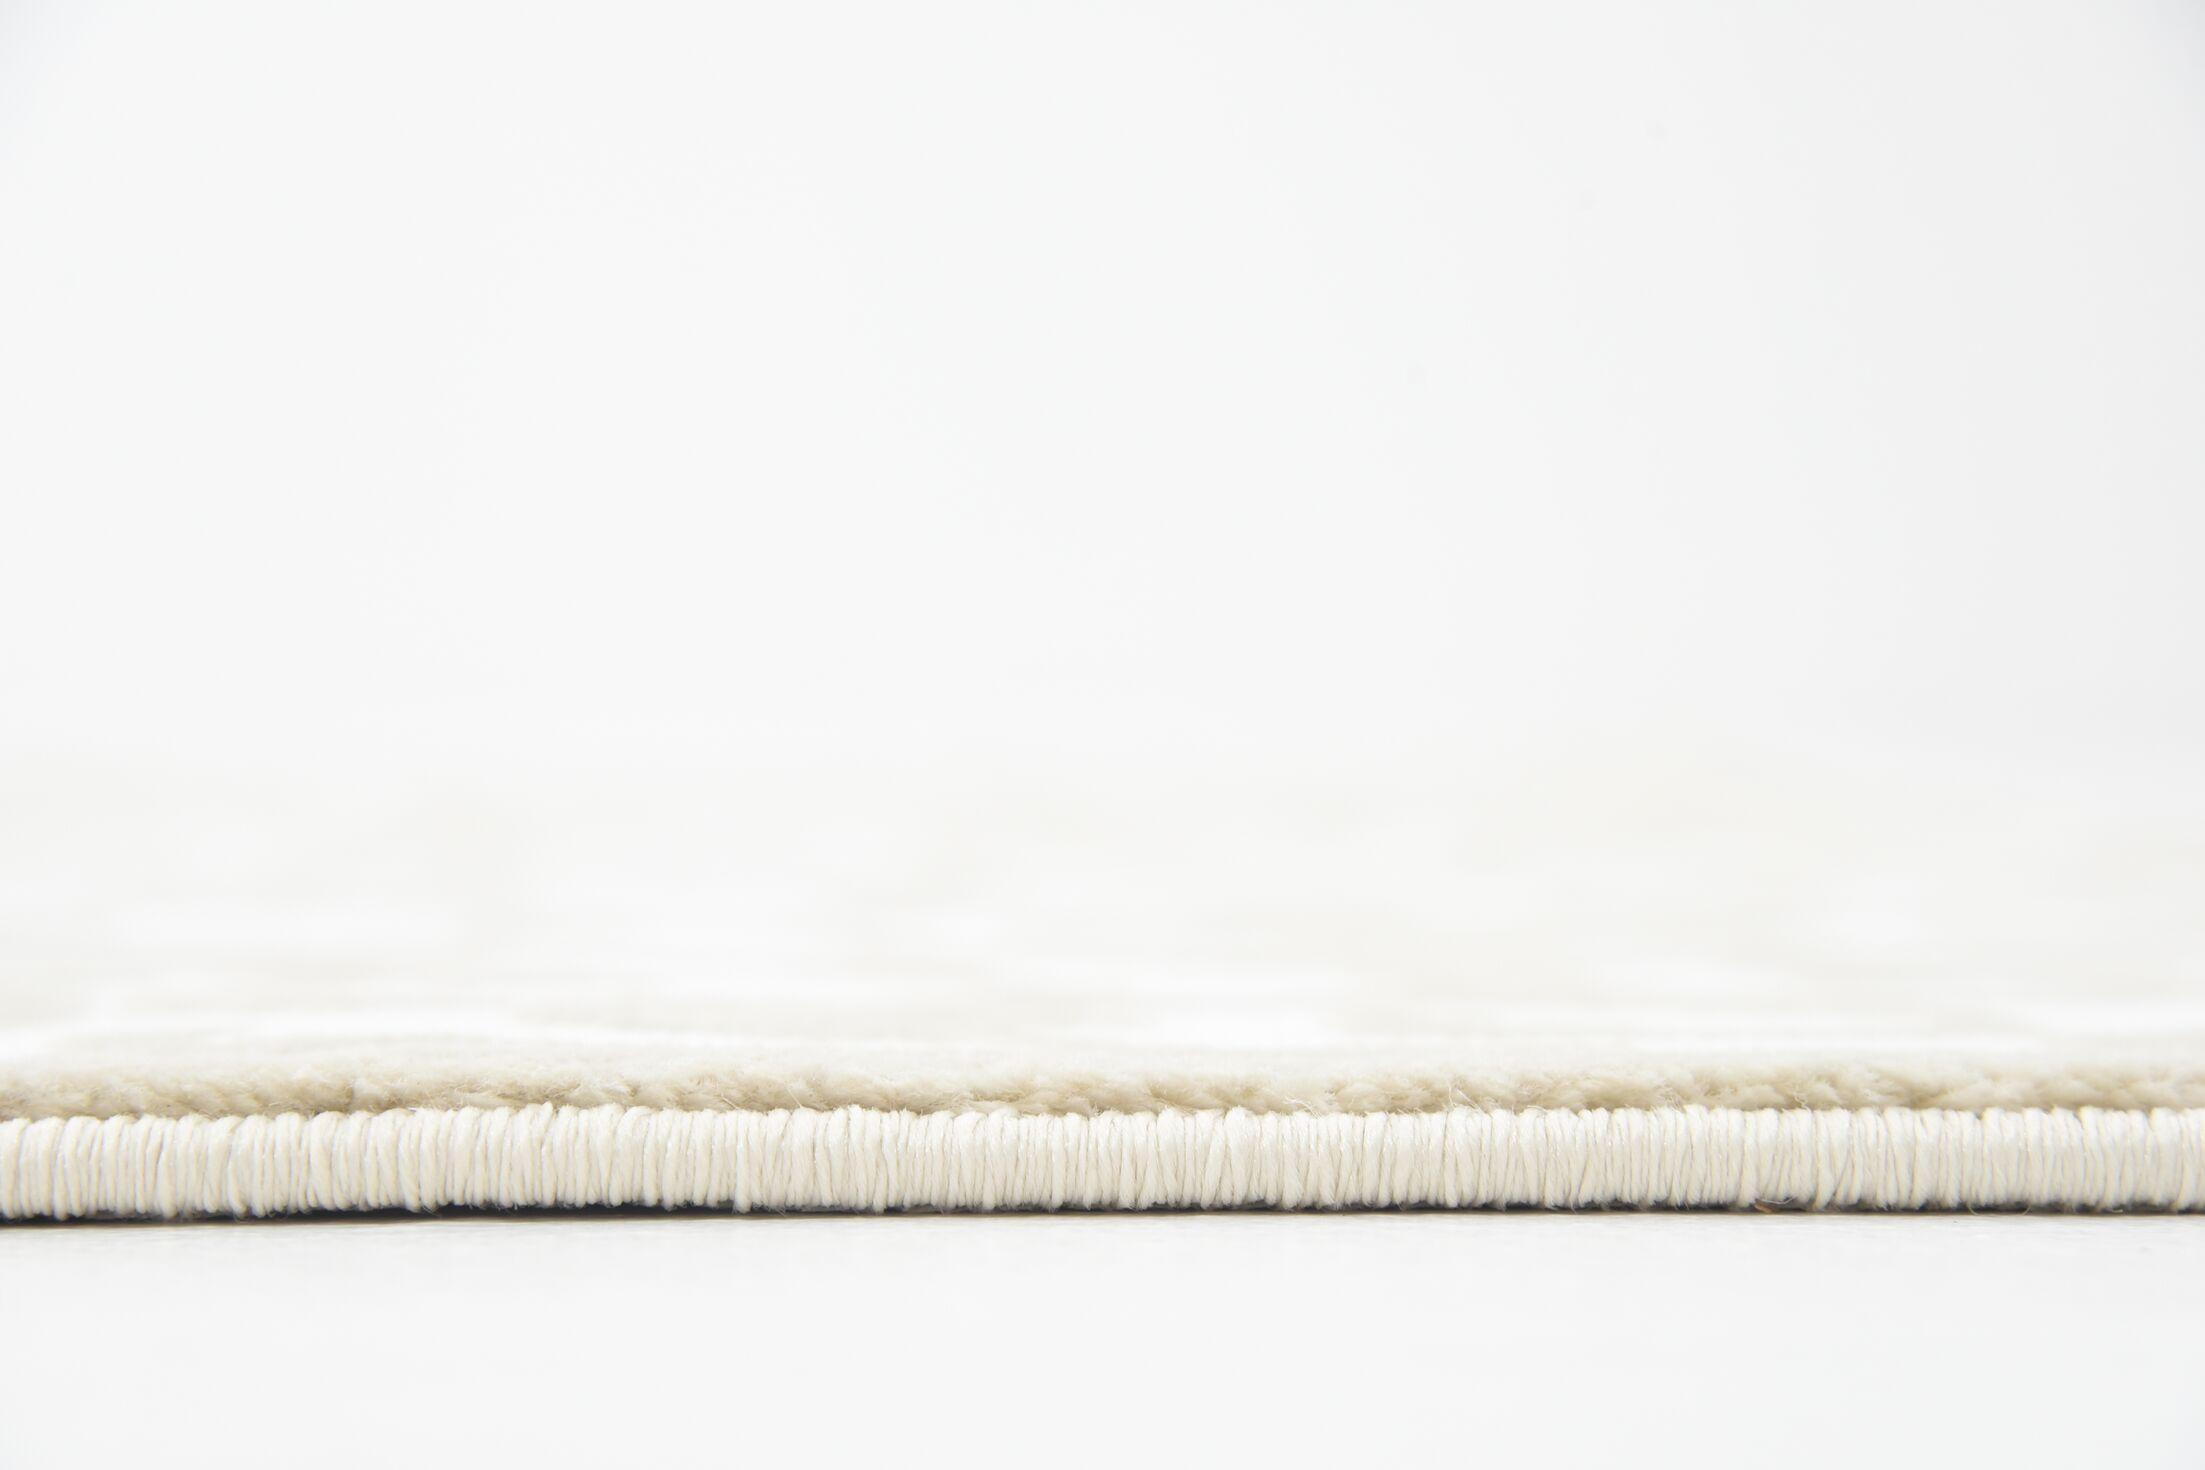 Mathieu Snow White/Beige Area Rug Rug Size: Rectangle 5' x 8'